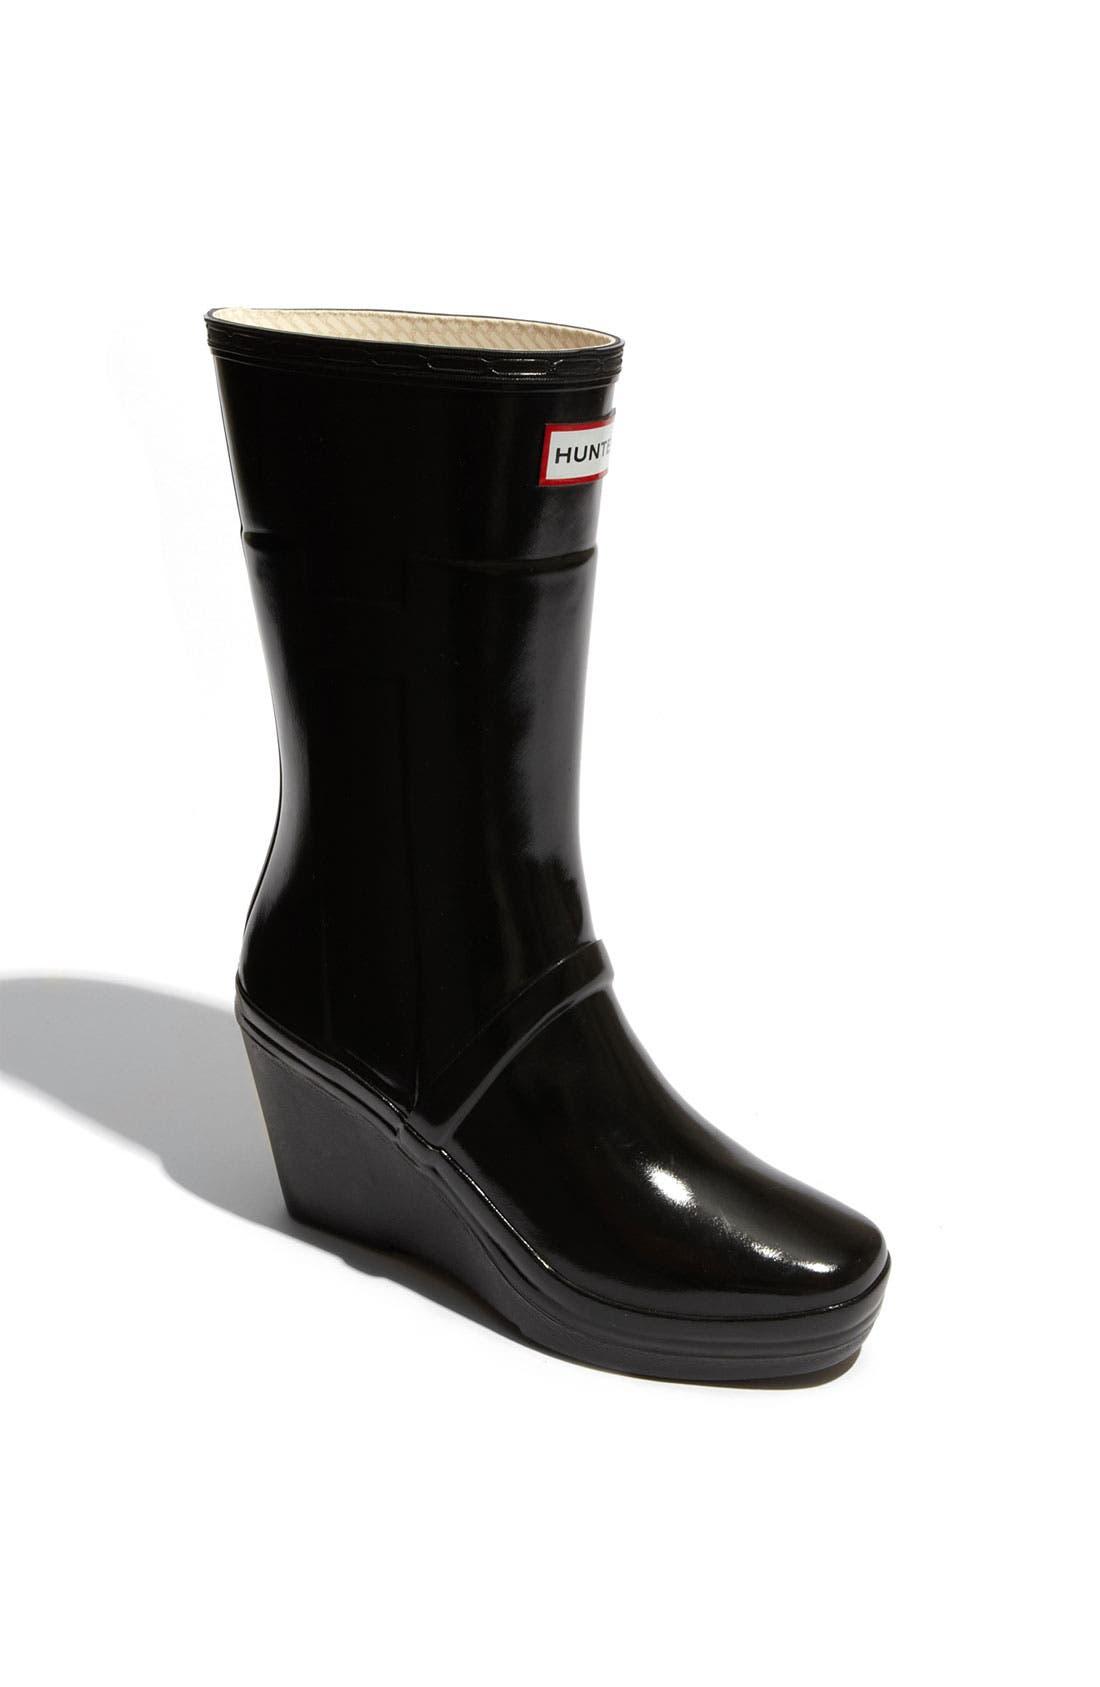 Alternate Image 1 Selected - Hunter 'Kellen' Wedge Heel Rain Boot